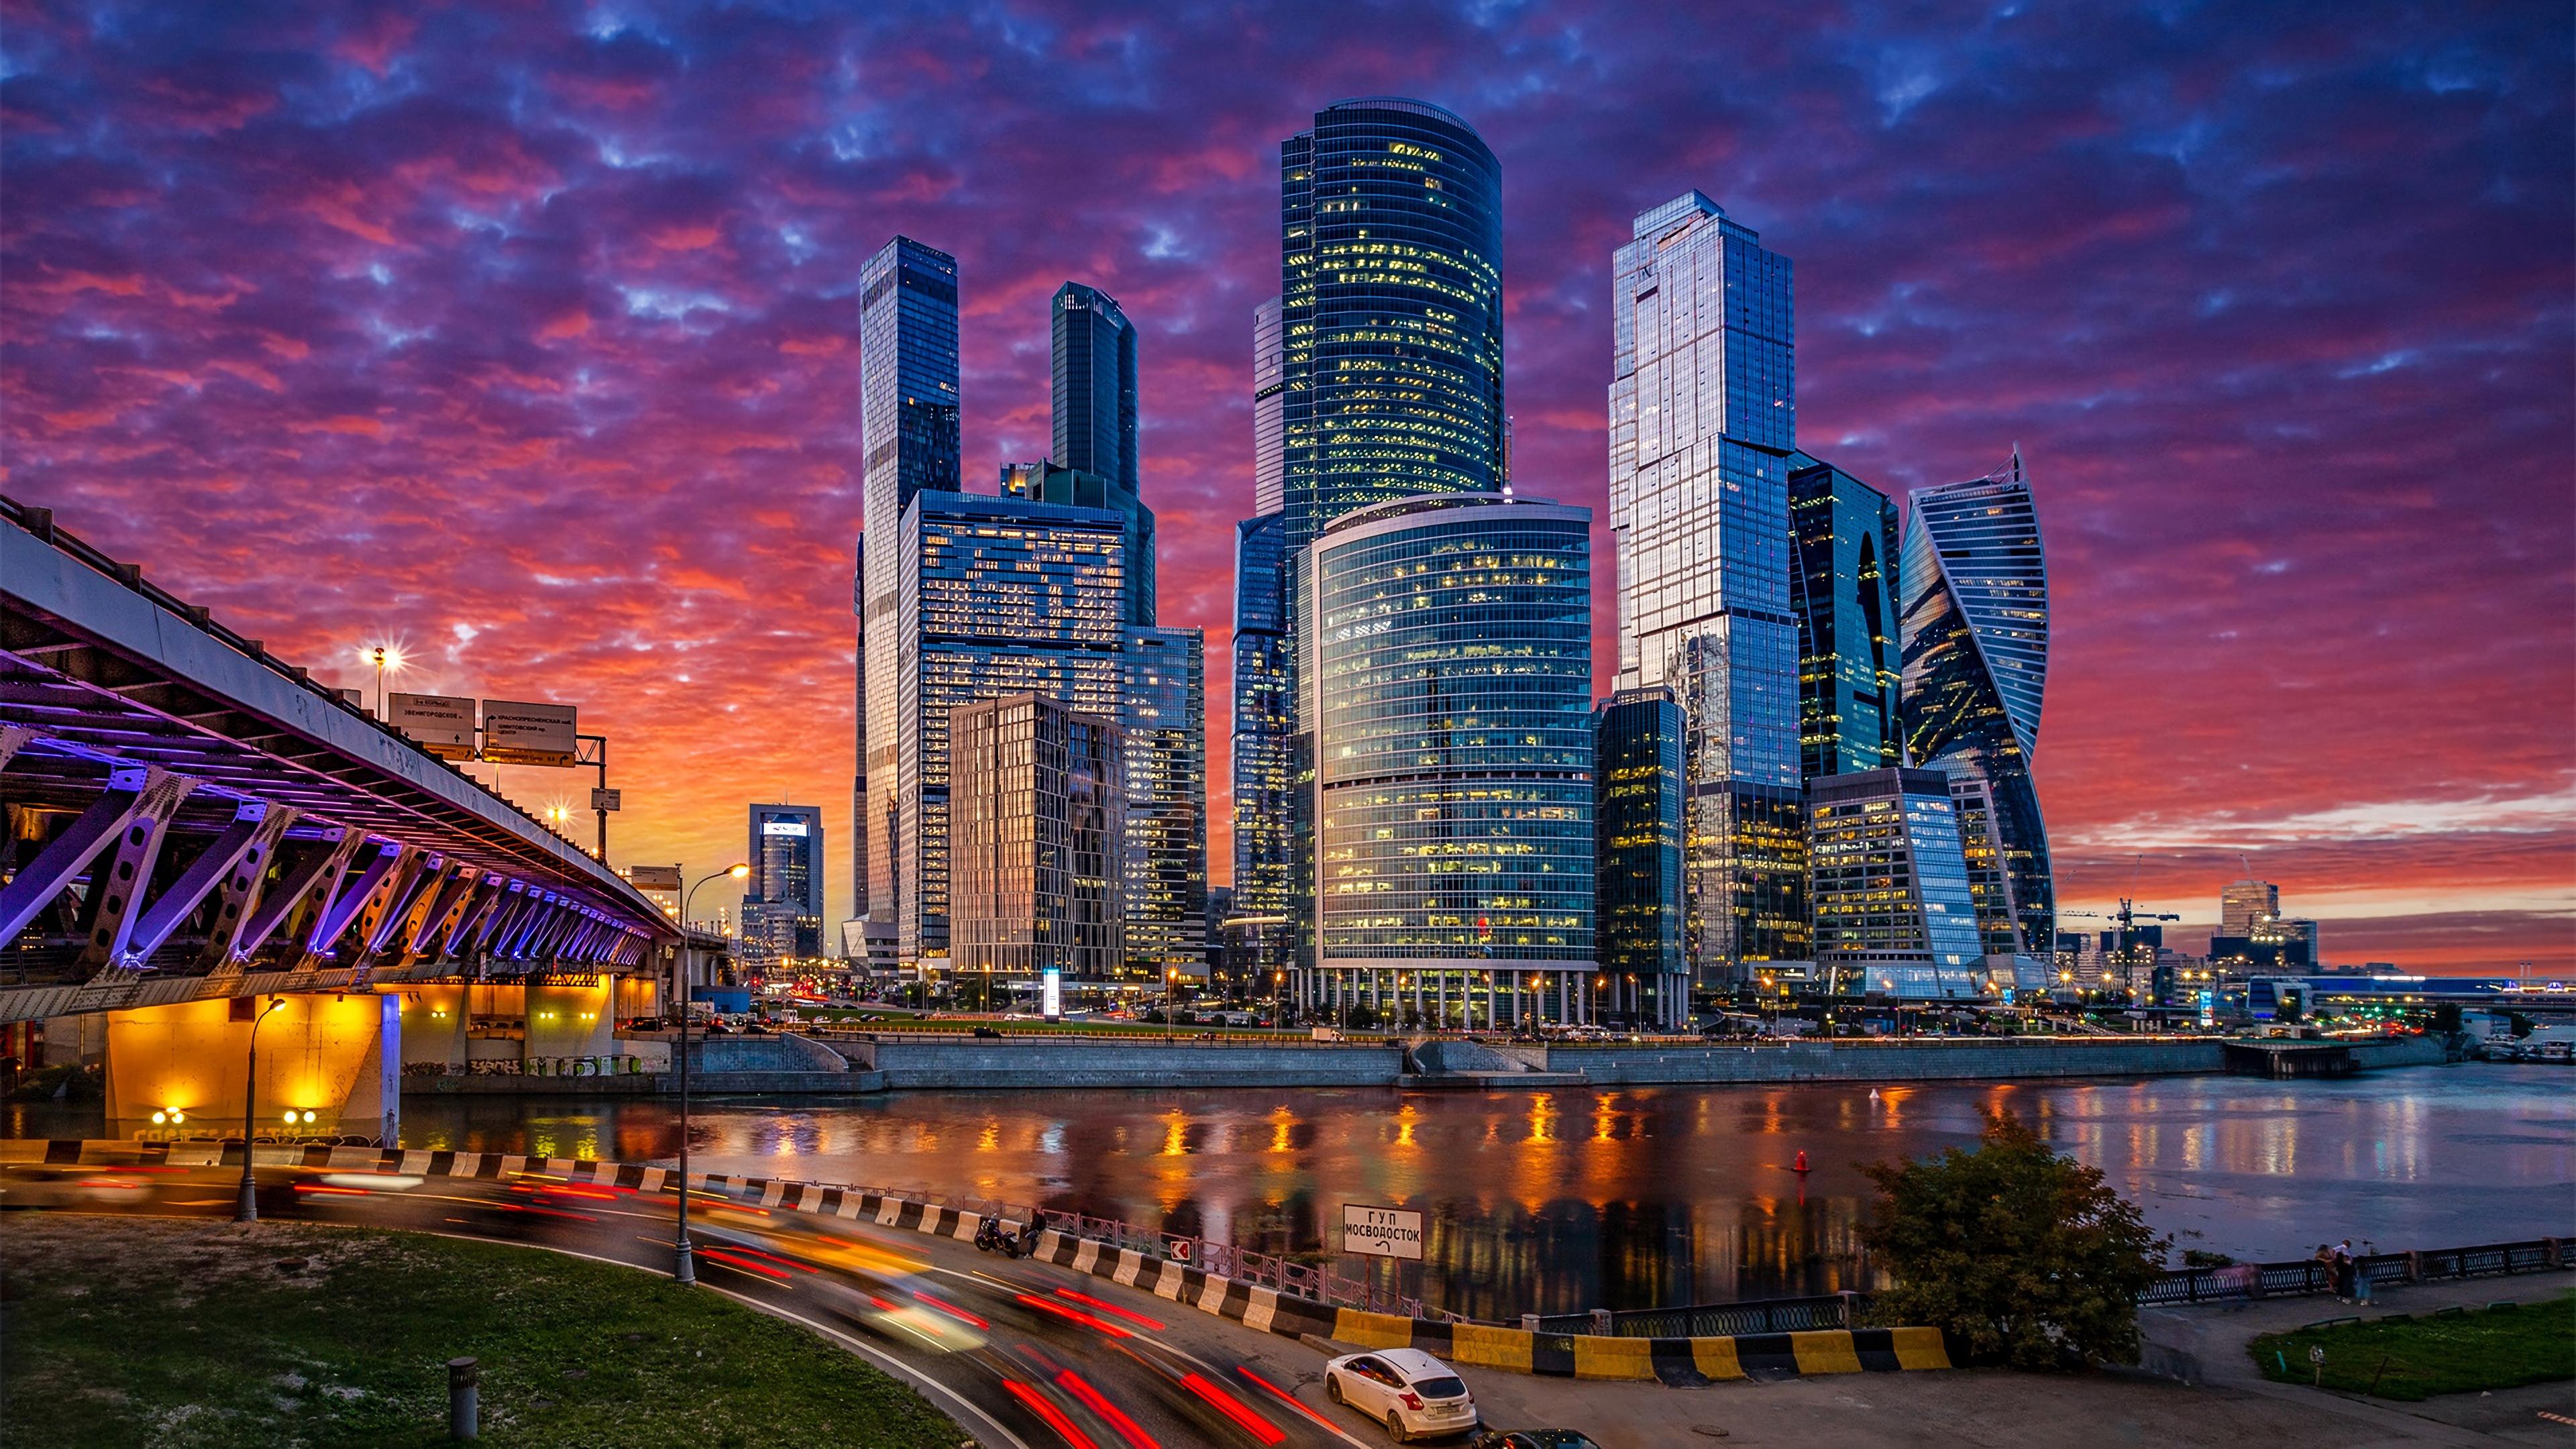 russia moscow cityscape 1569187775 - Russia Moscow Cityscape - world wallpapers, moscow wallpapers, hd-wallpapers, cityscape wallpapers, buildings wallpapers, 4k-wallpapers